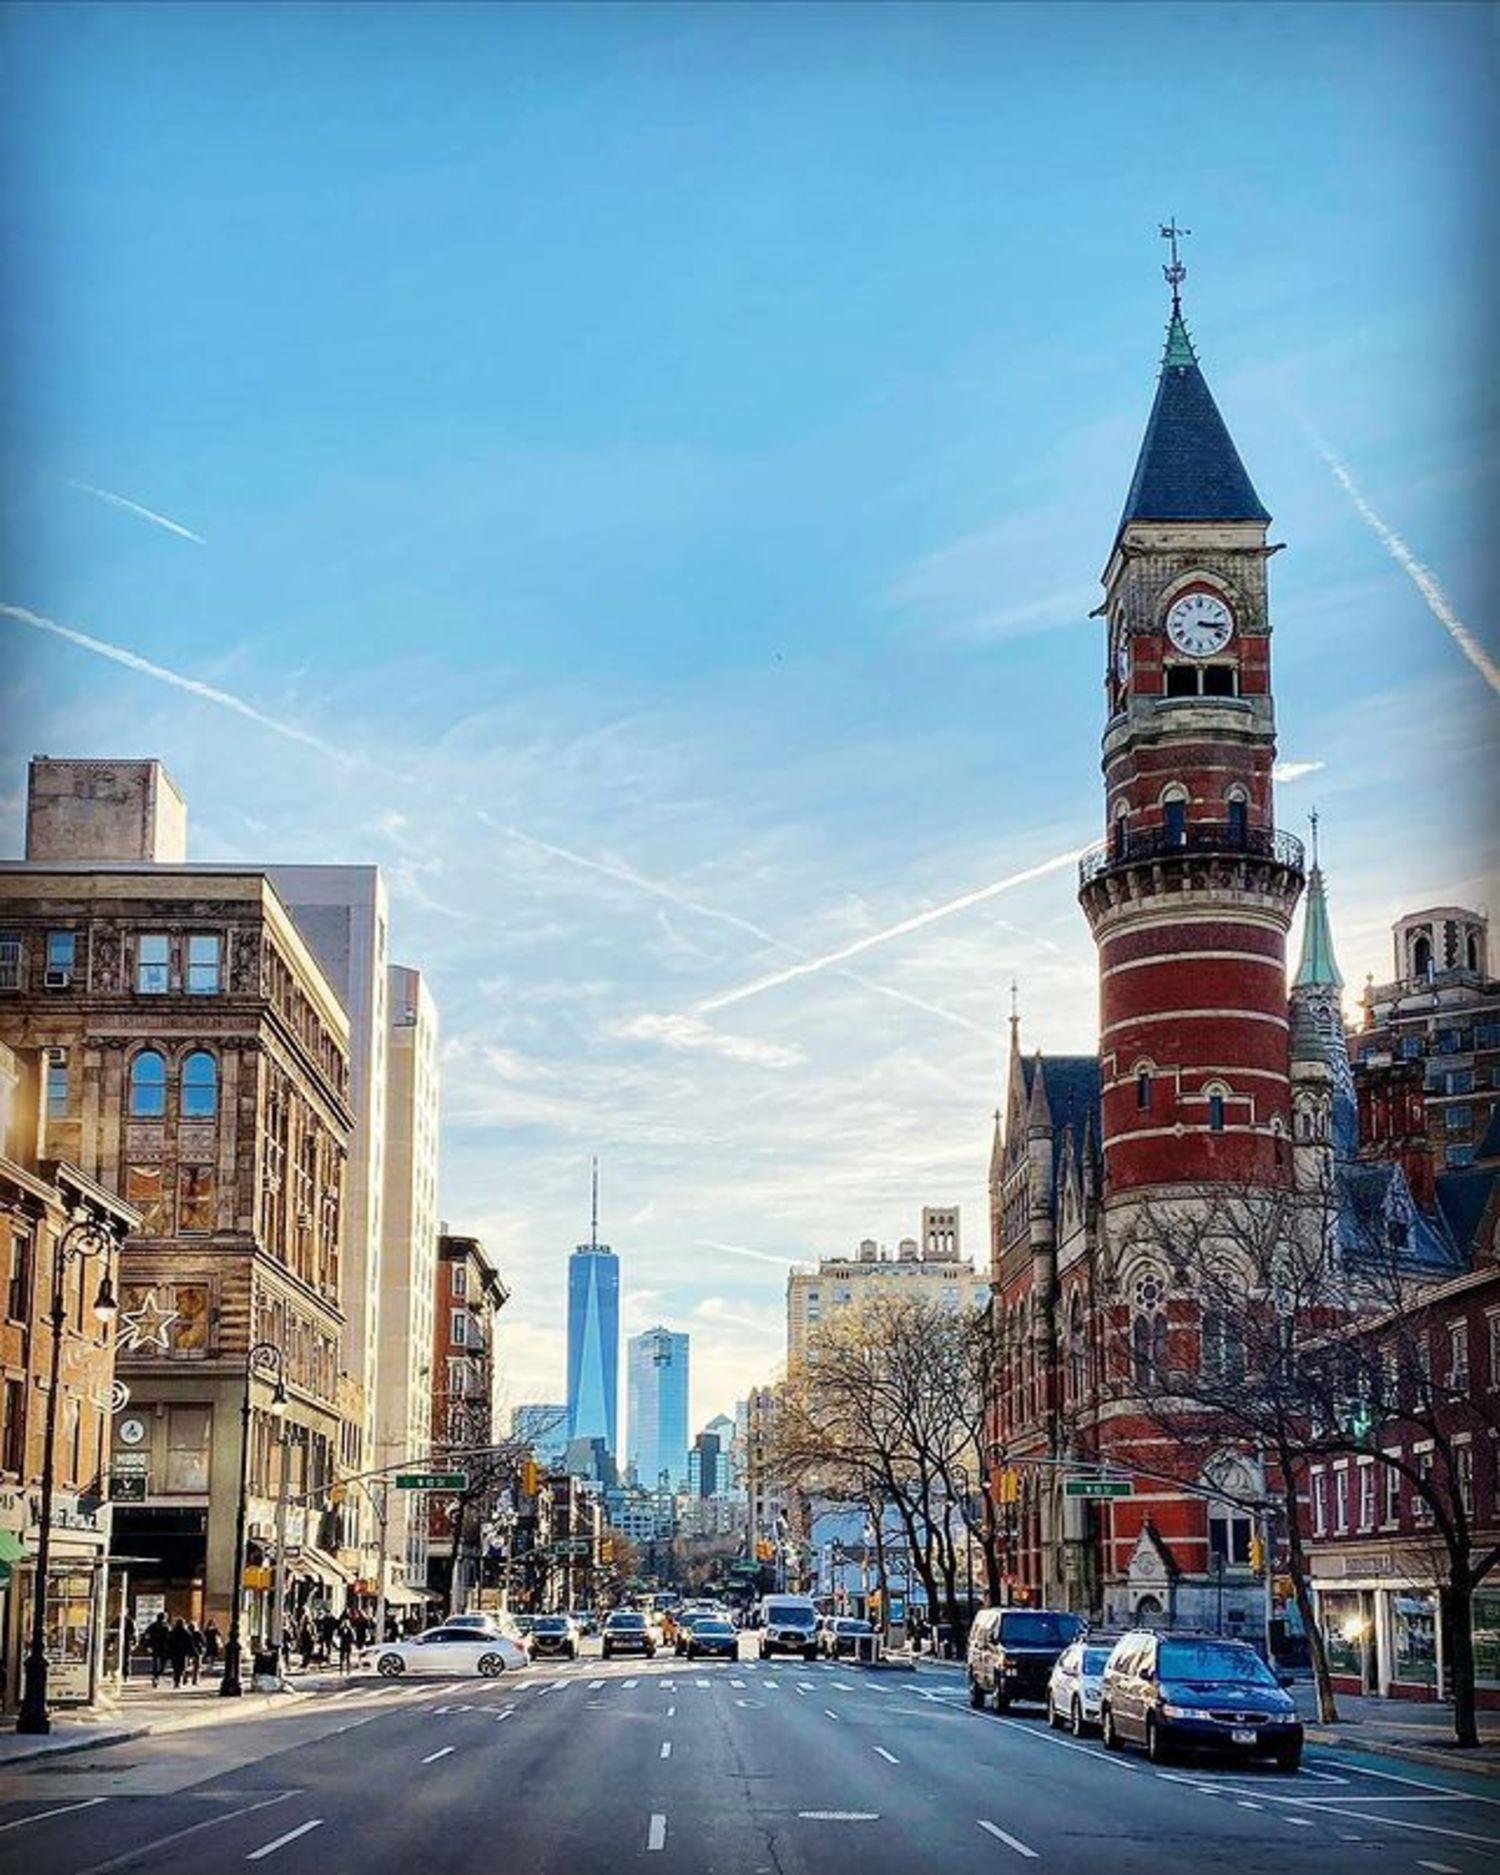 Looking down 6th Avenue from 14th Street, Greenwich Village, Manhattan